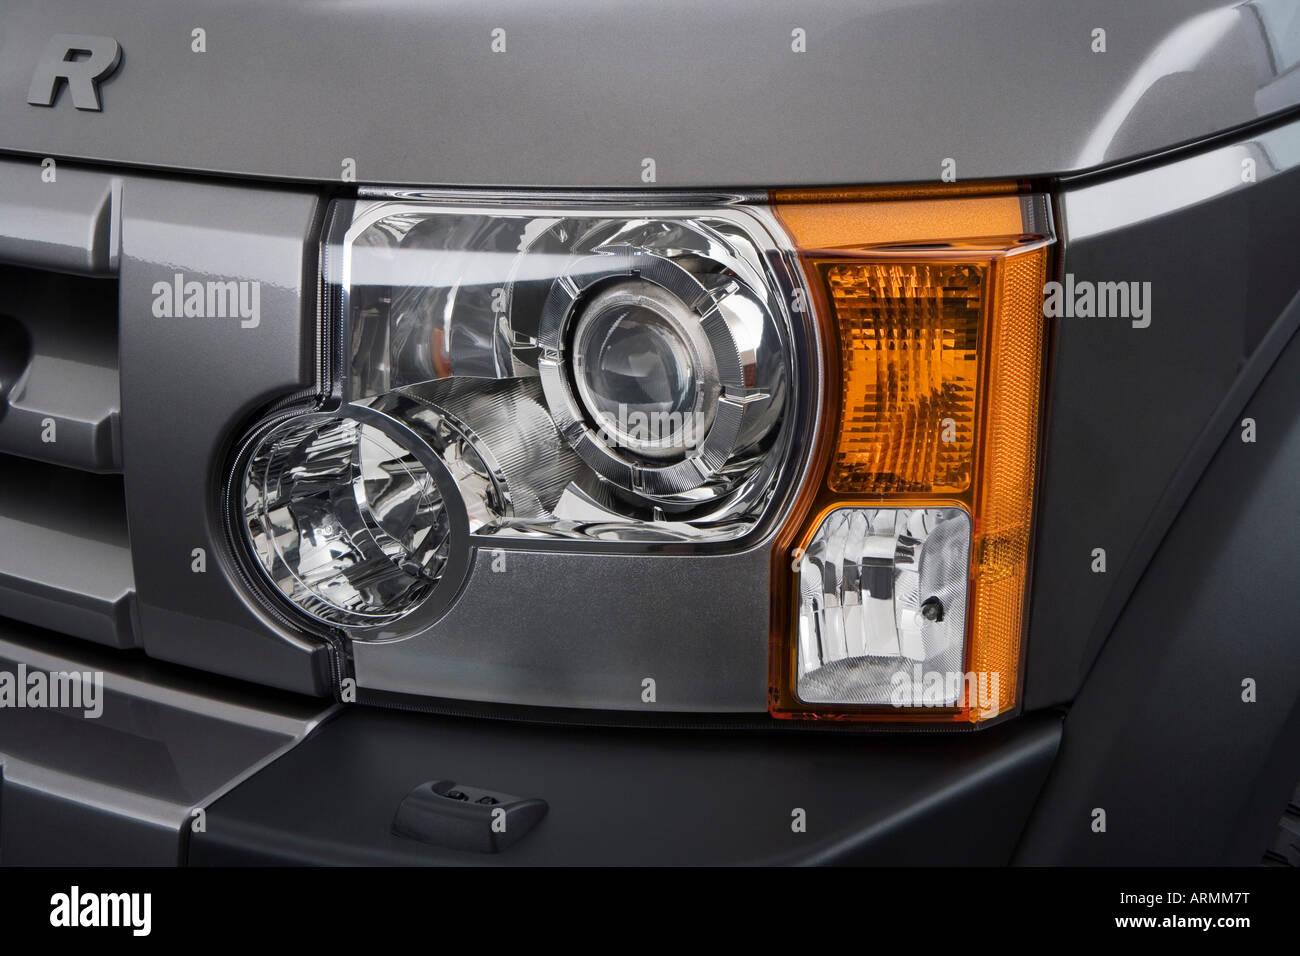 aftermarket land rover lr3 headlights